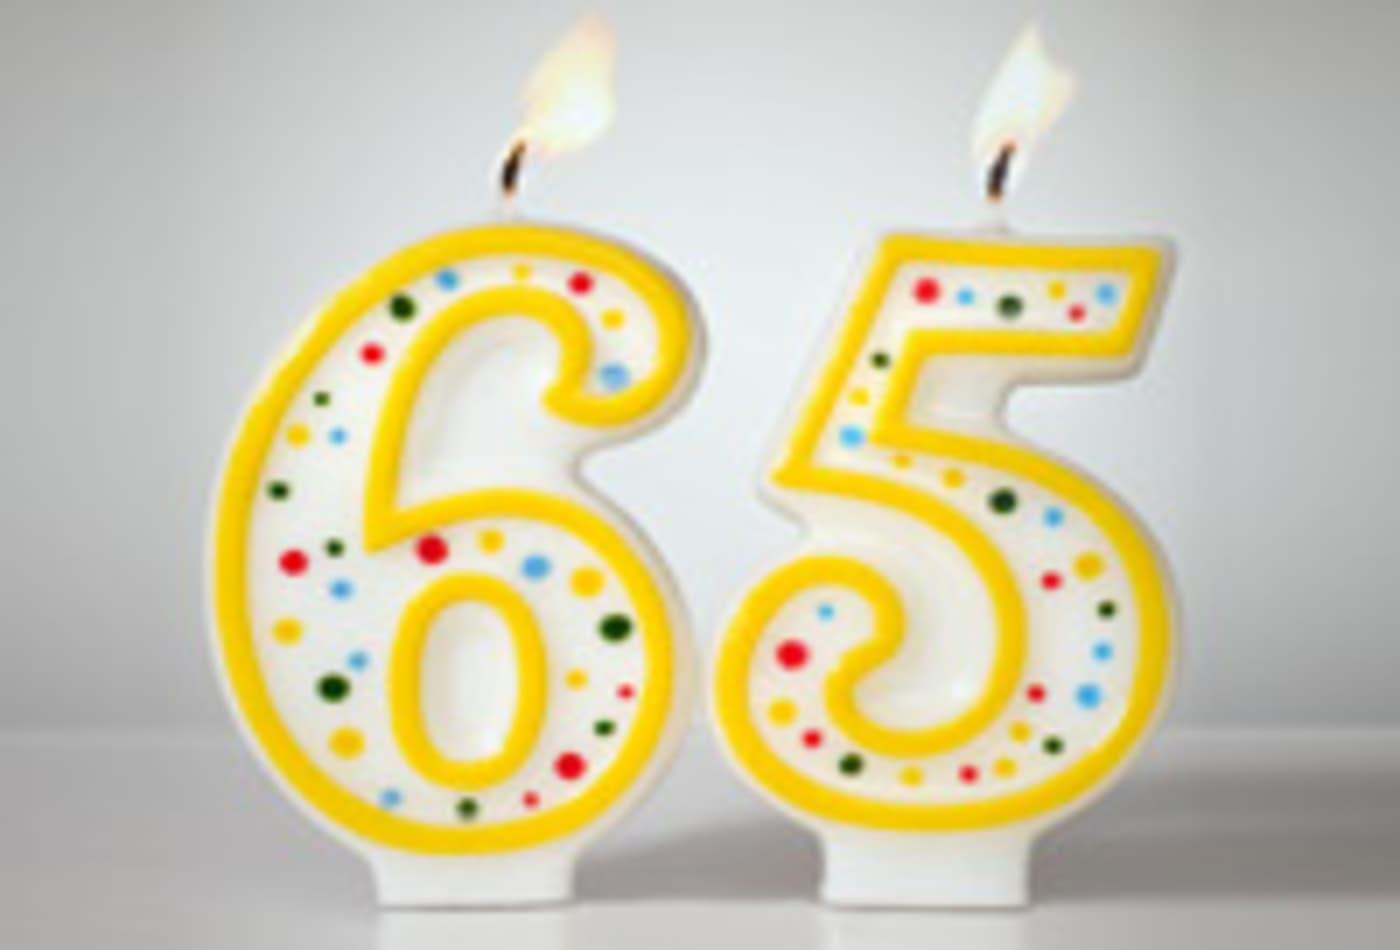 65-birthday-candles-200.jpg